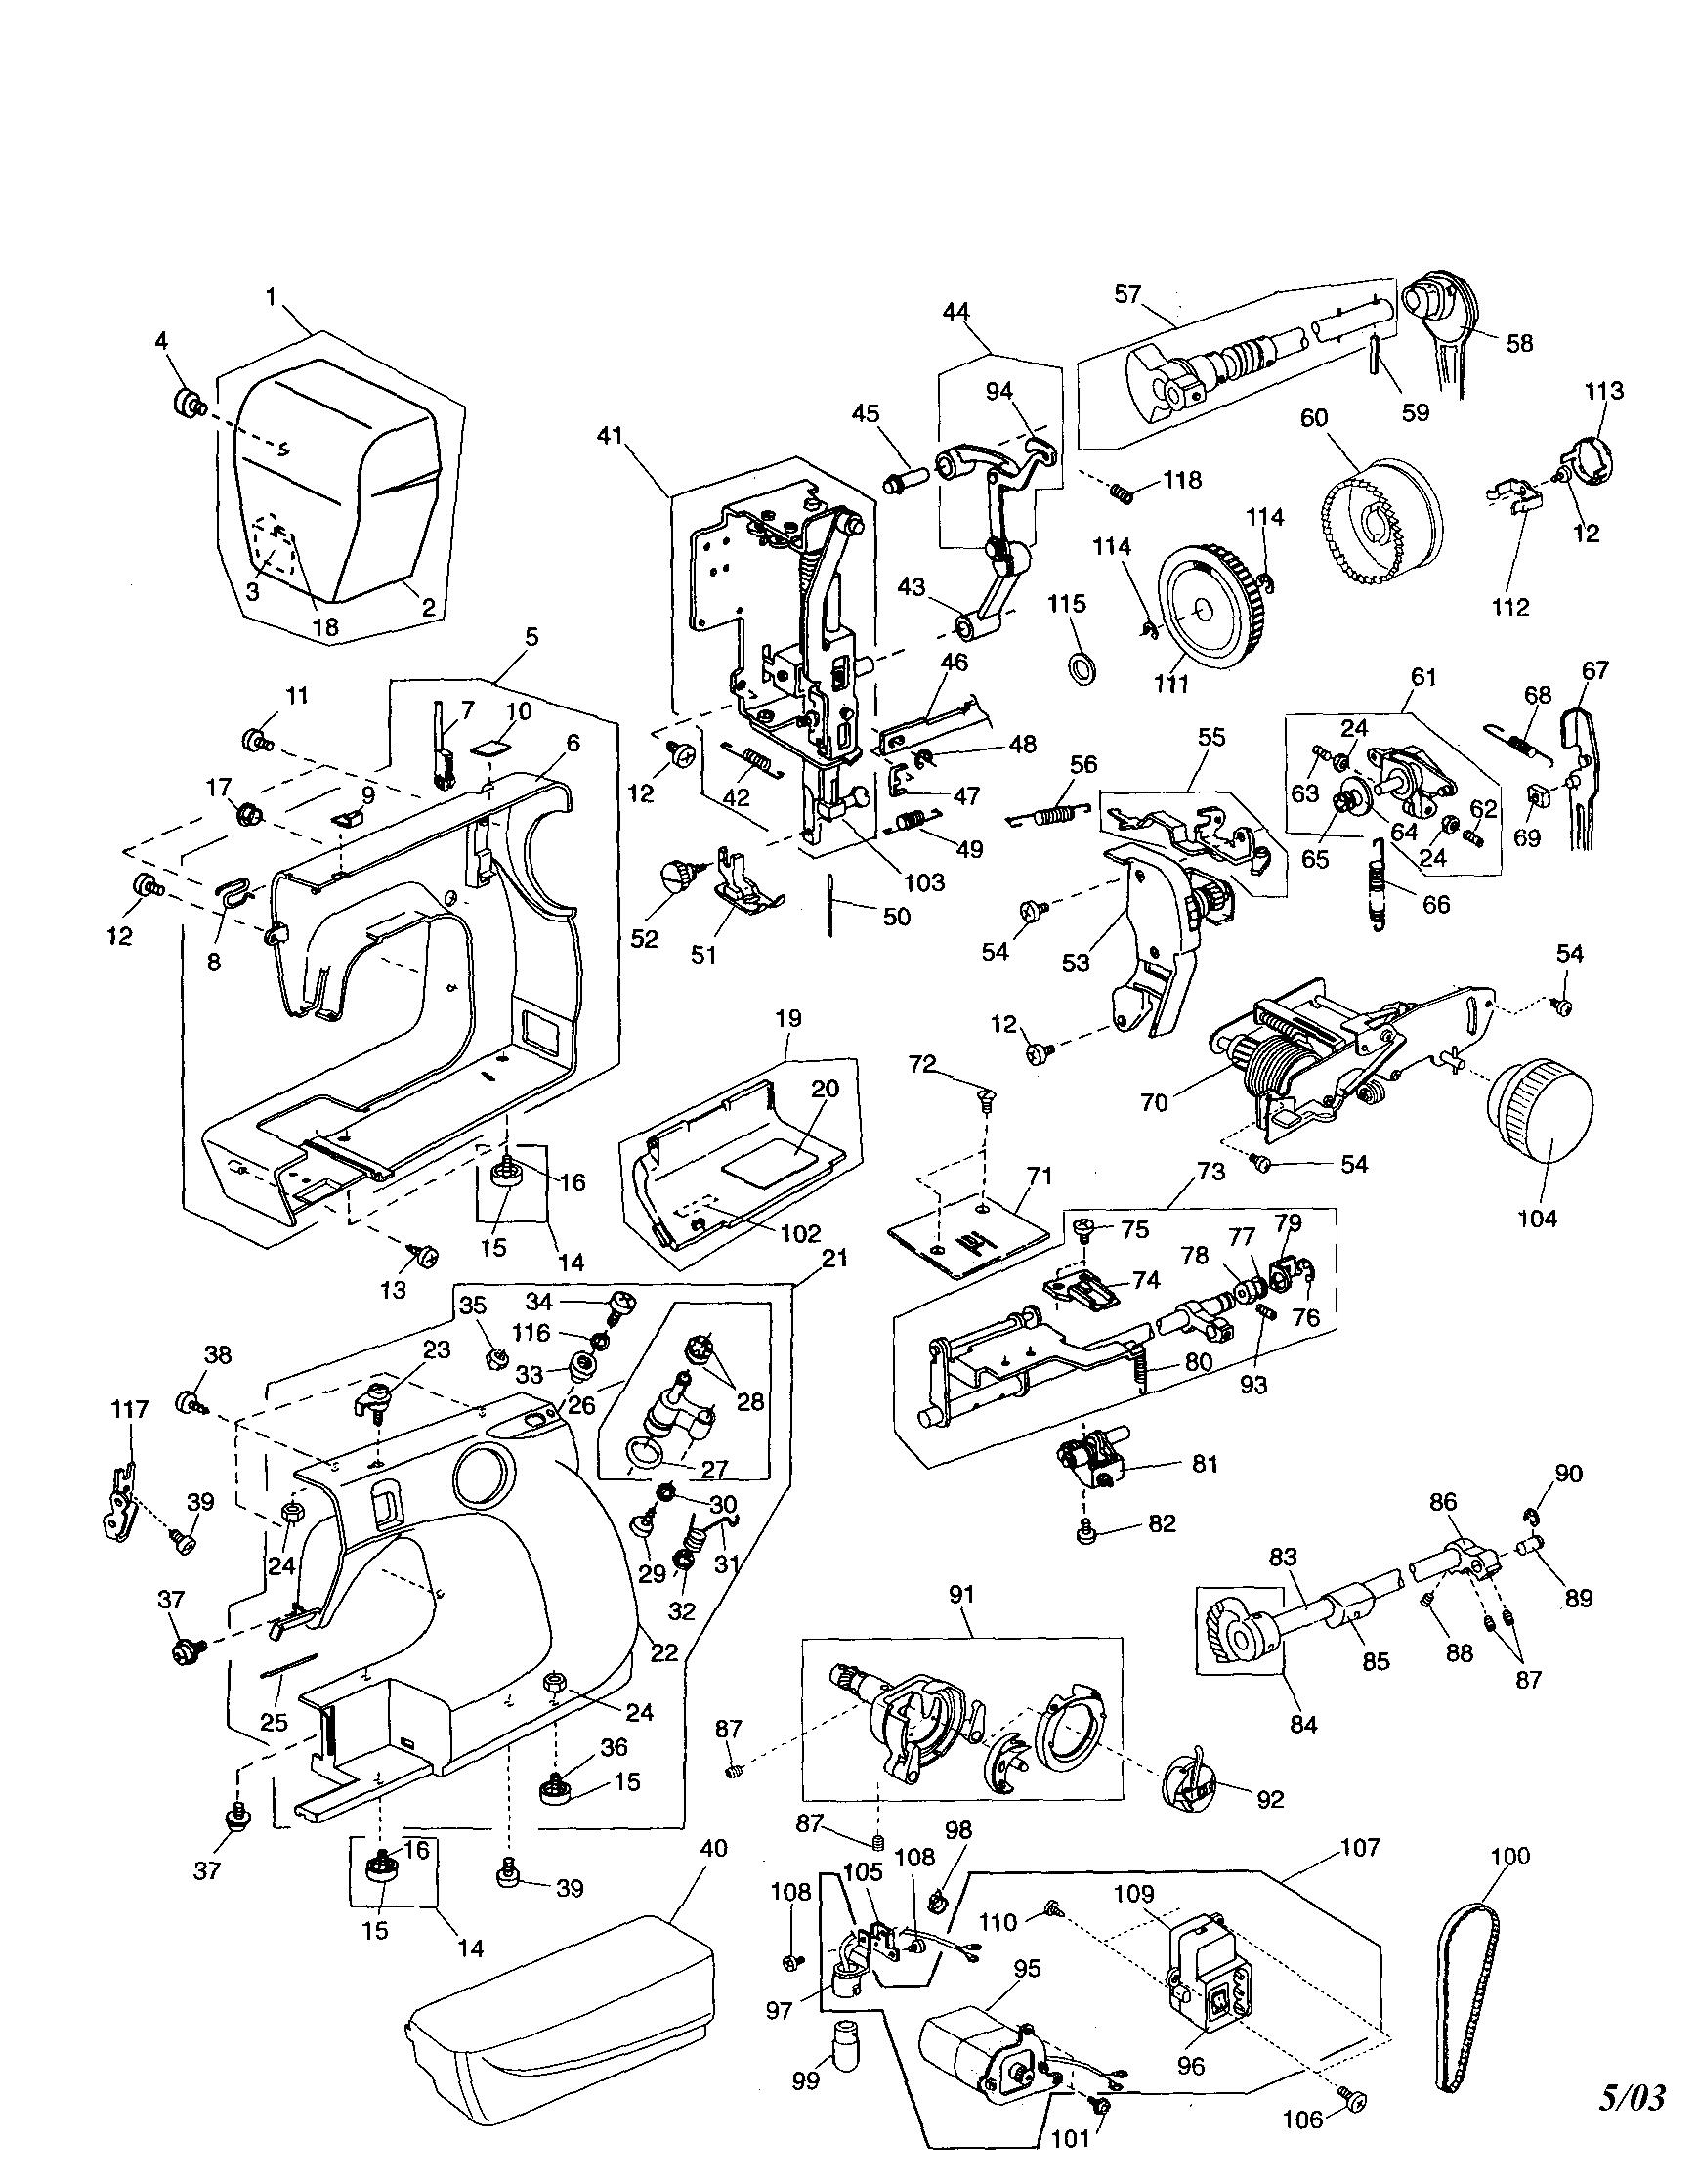 medium resolution of kenmore sewing machine model 38511206300 sewing machine parts diagram